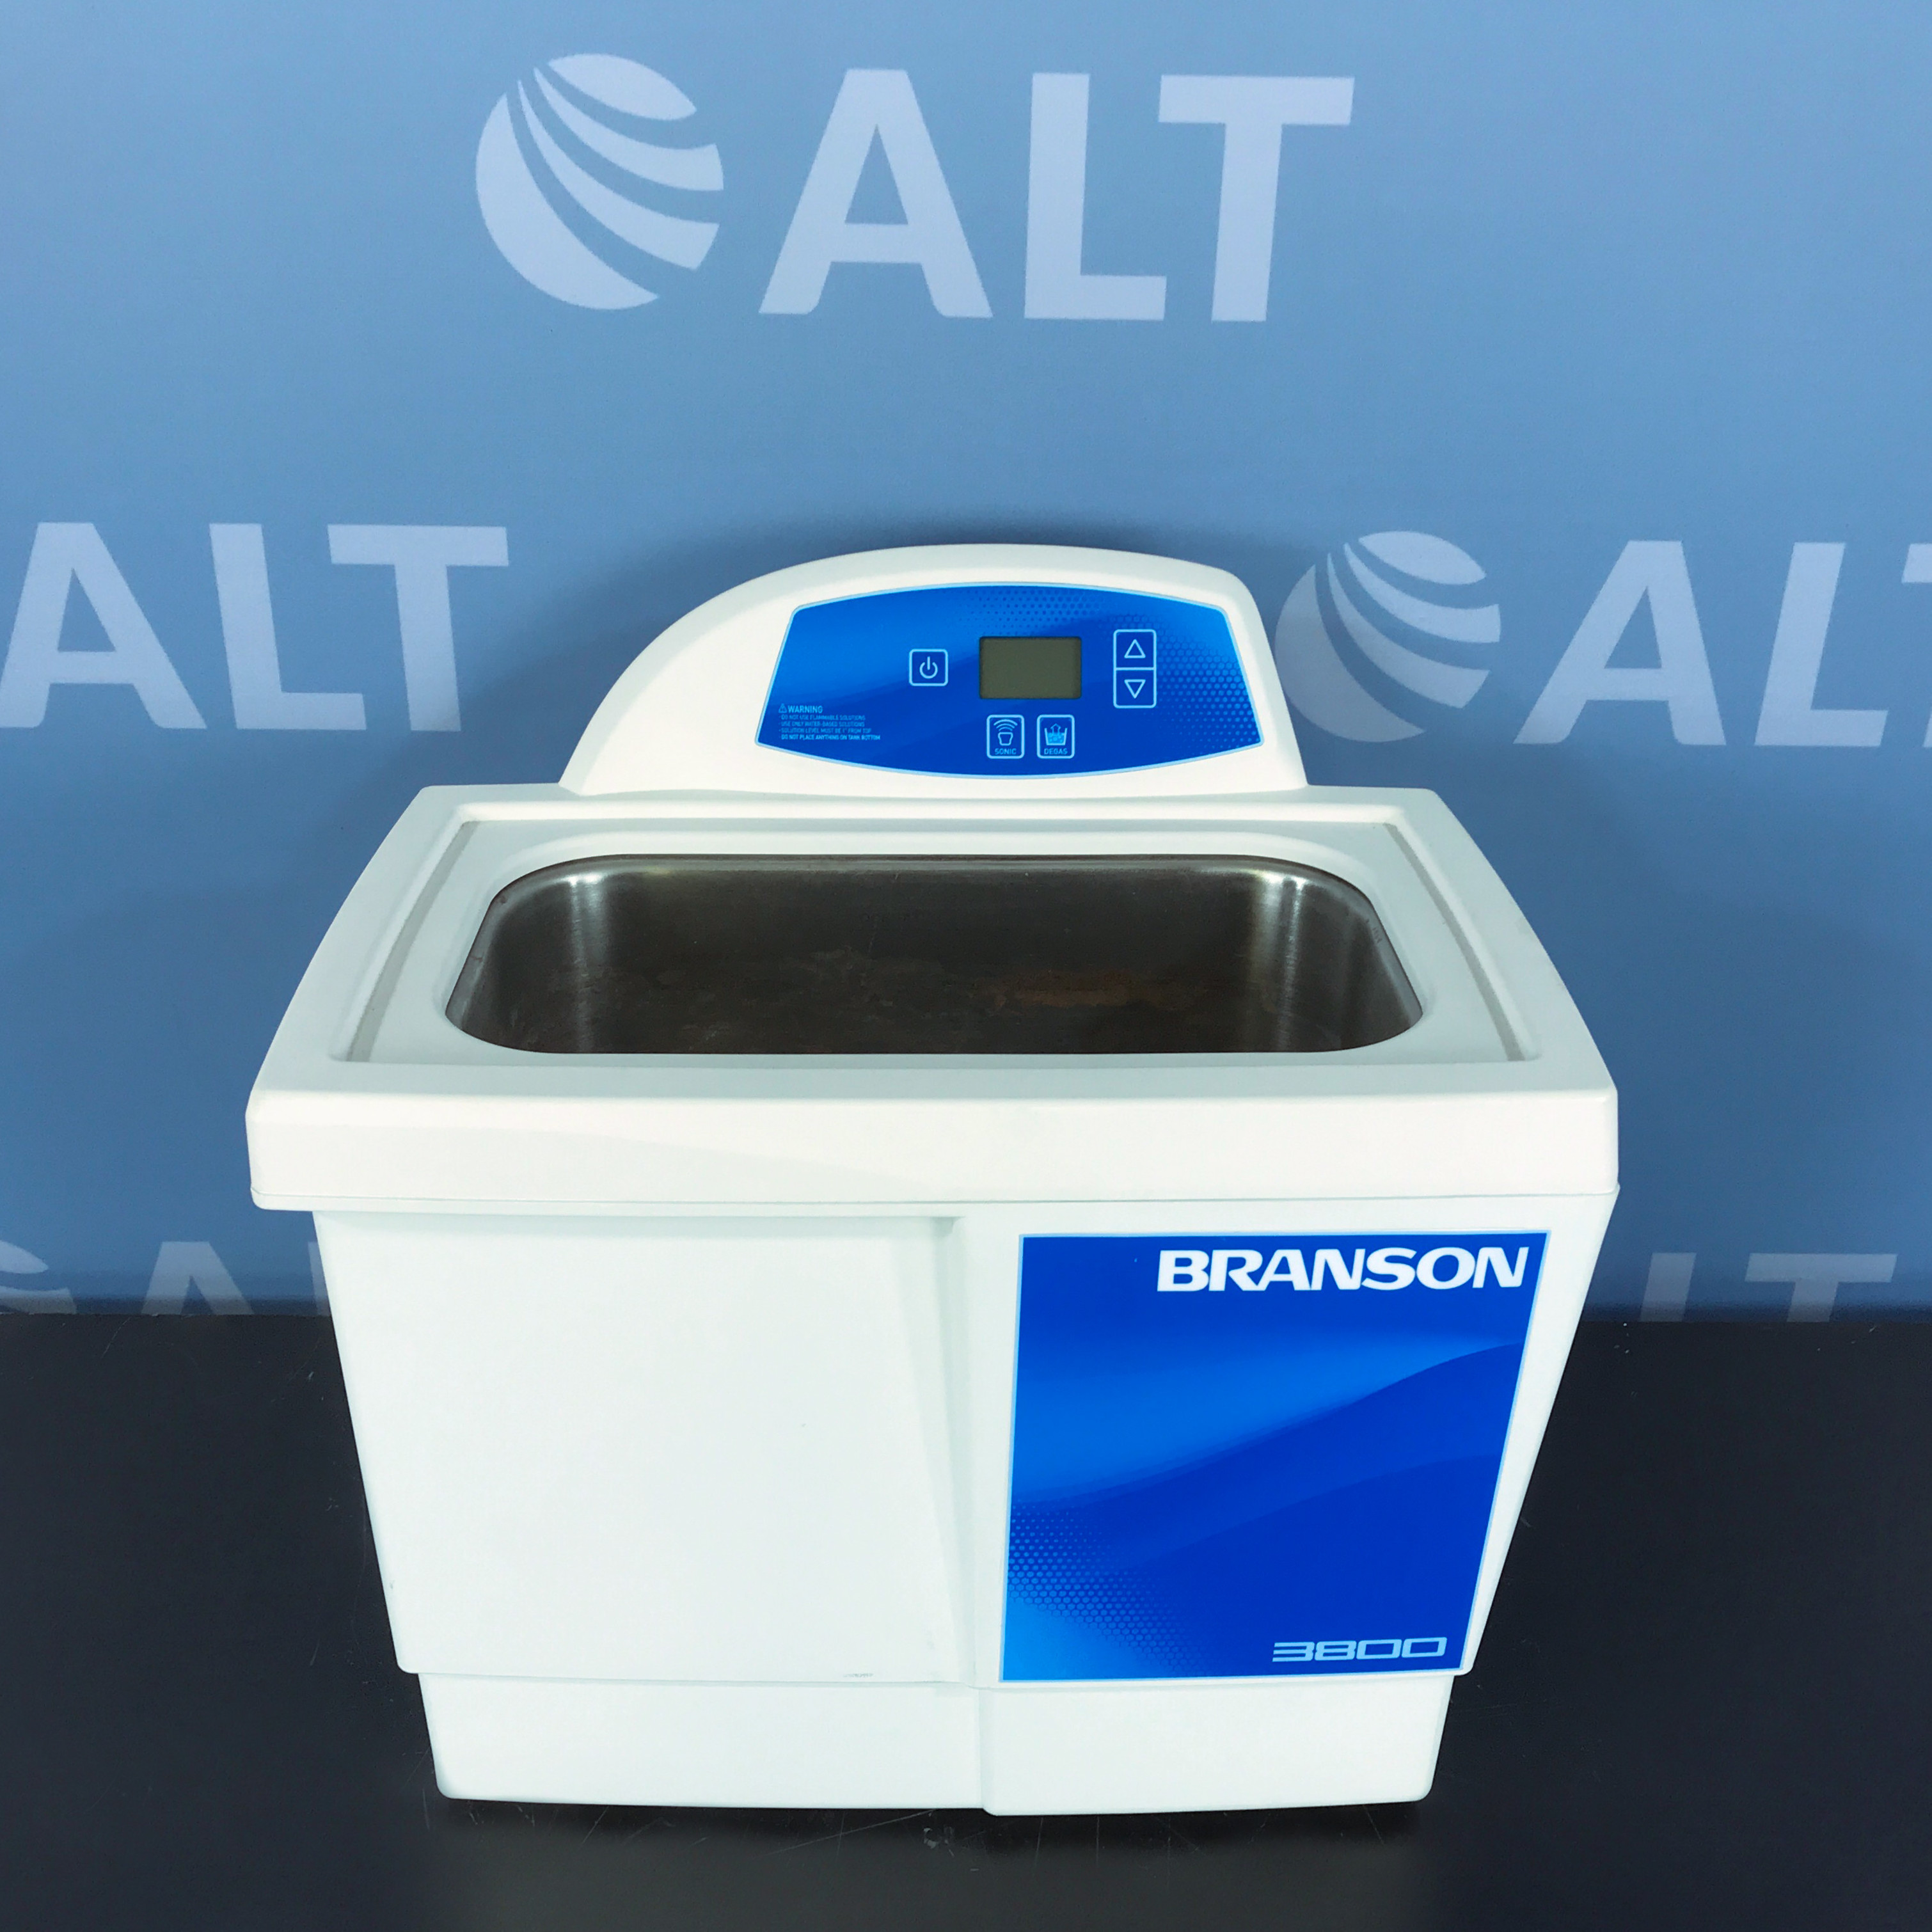 Branson 3800 Ultrasonic Cleaner Image